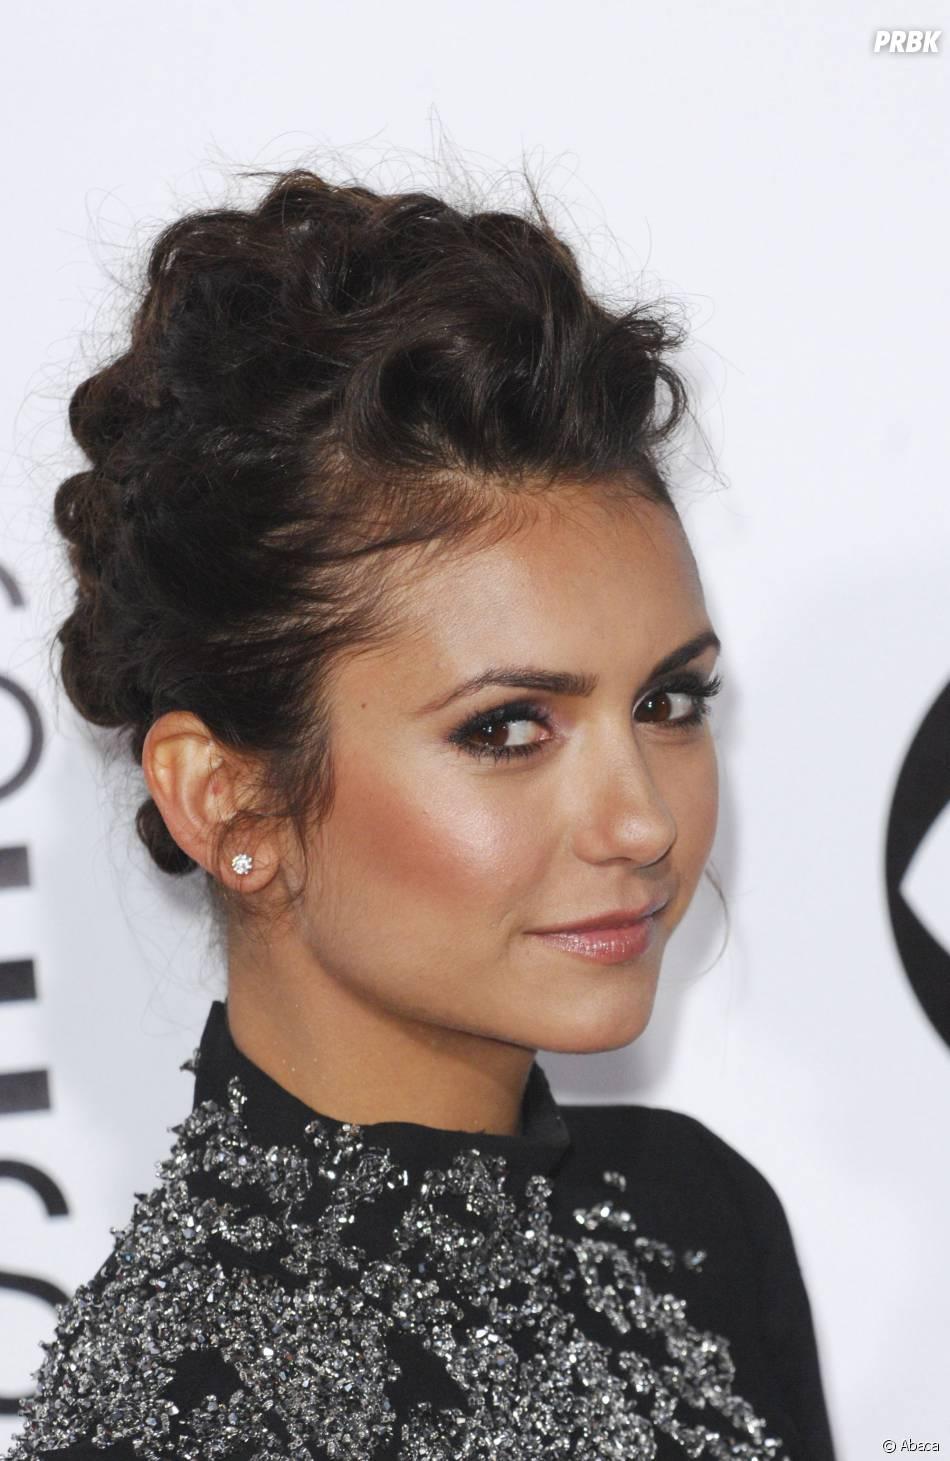 People's Choice Awards 2014 : Nina Dobrev sur le tapis-rouge